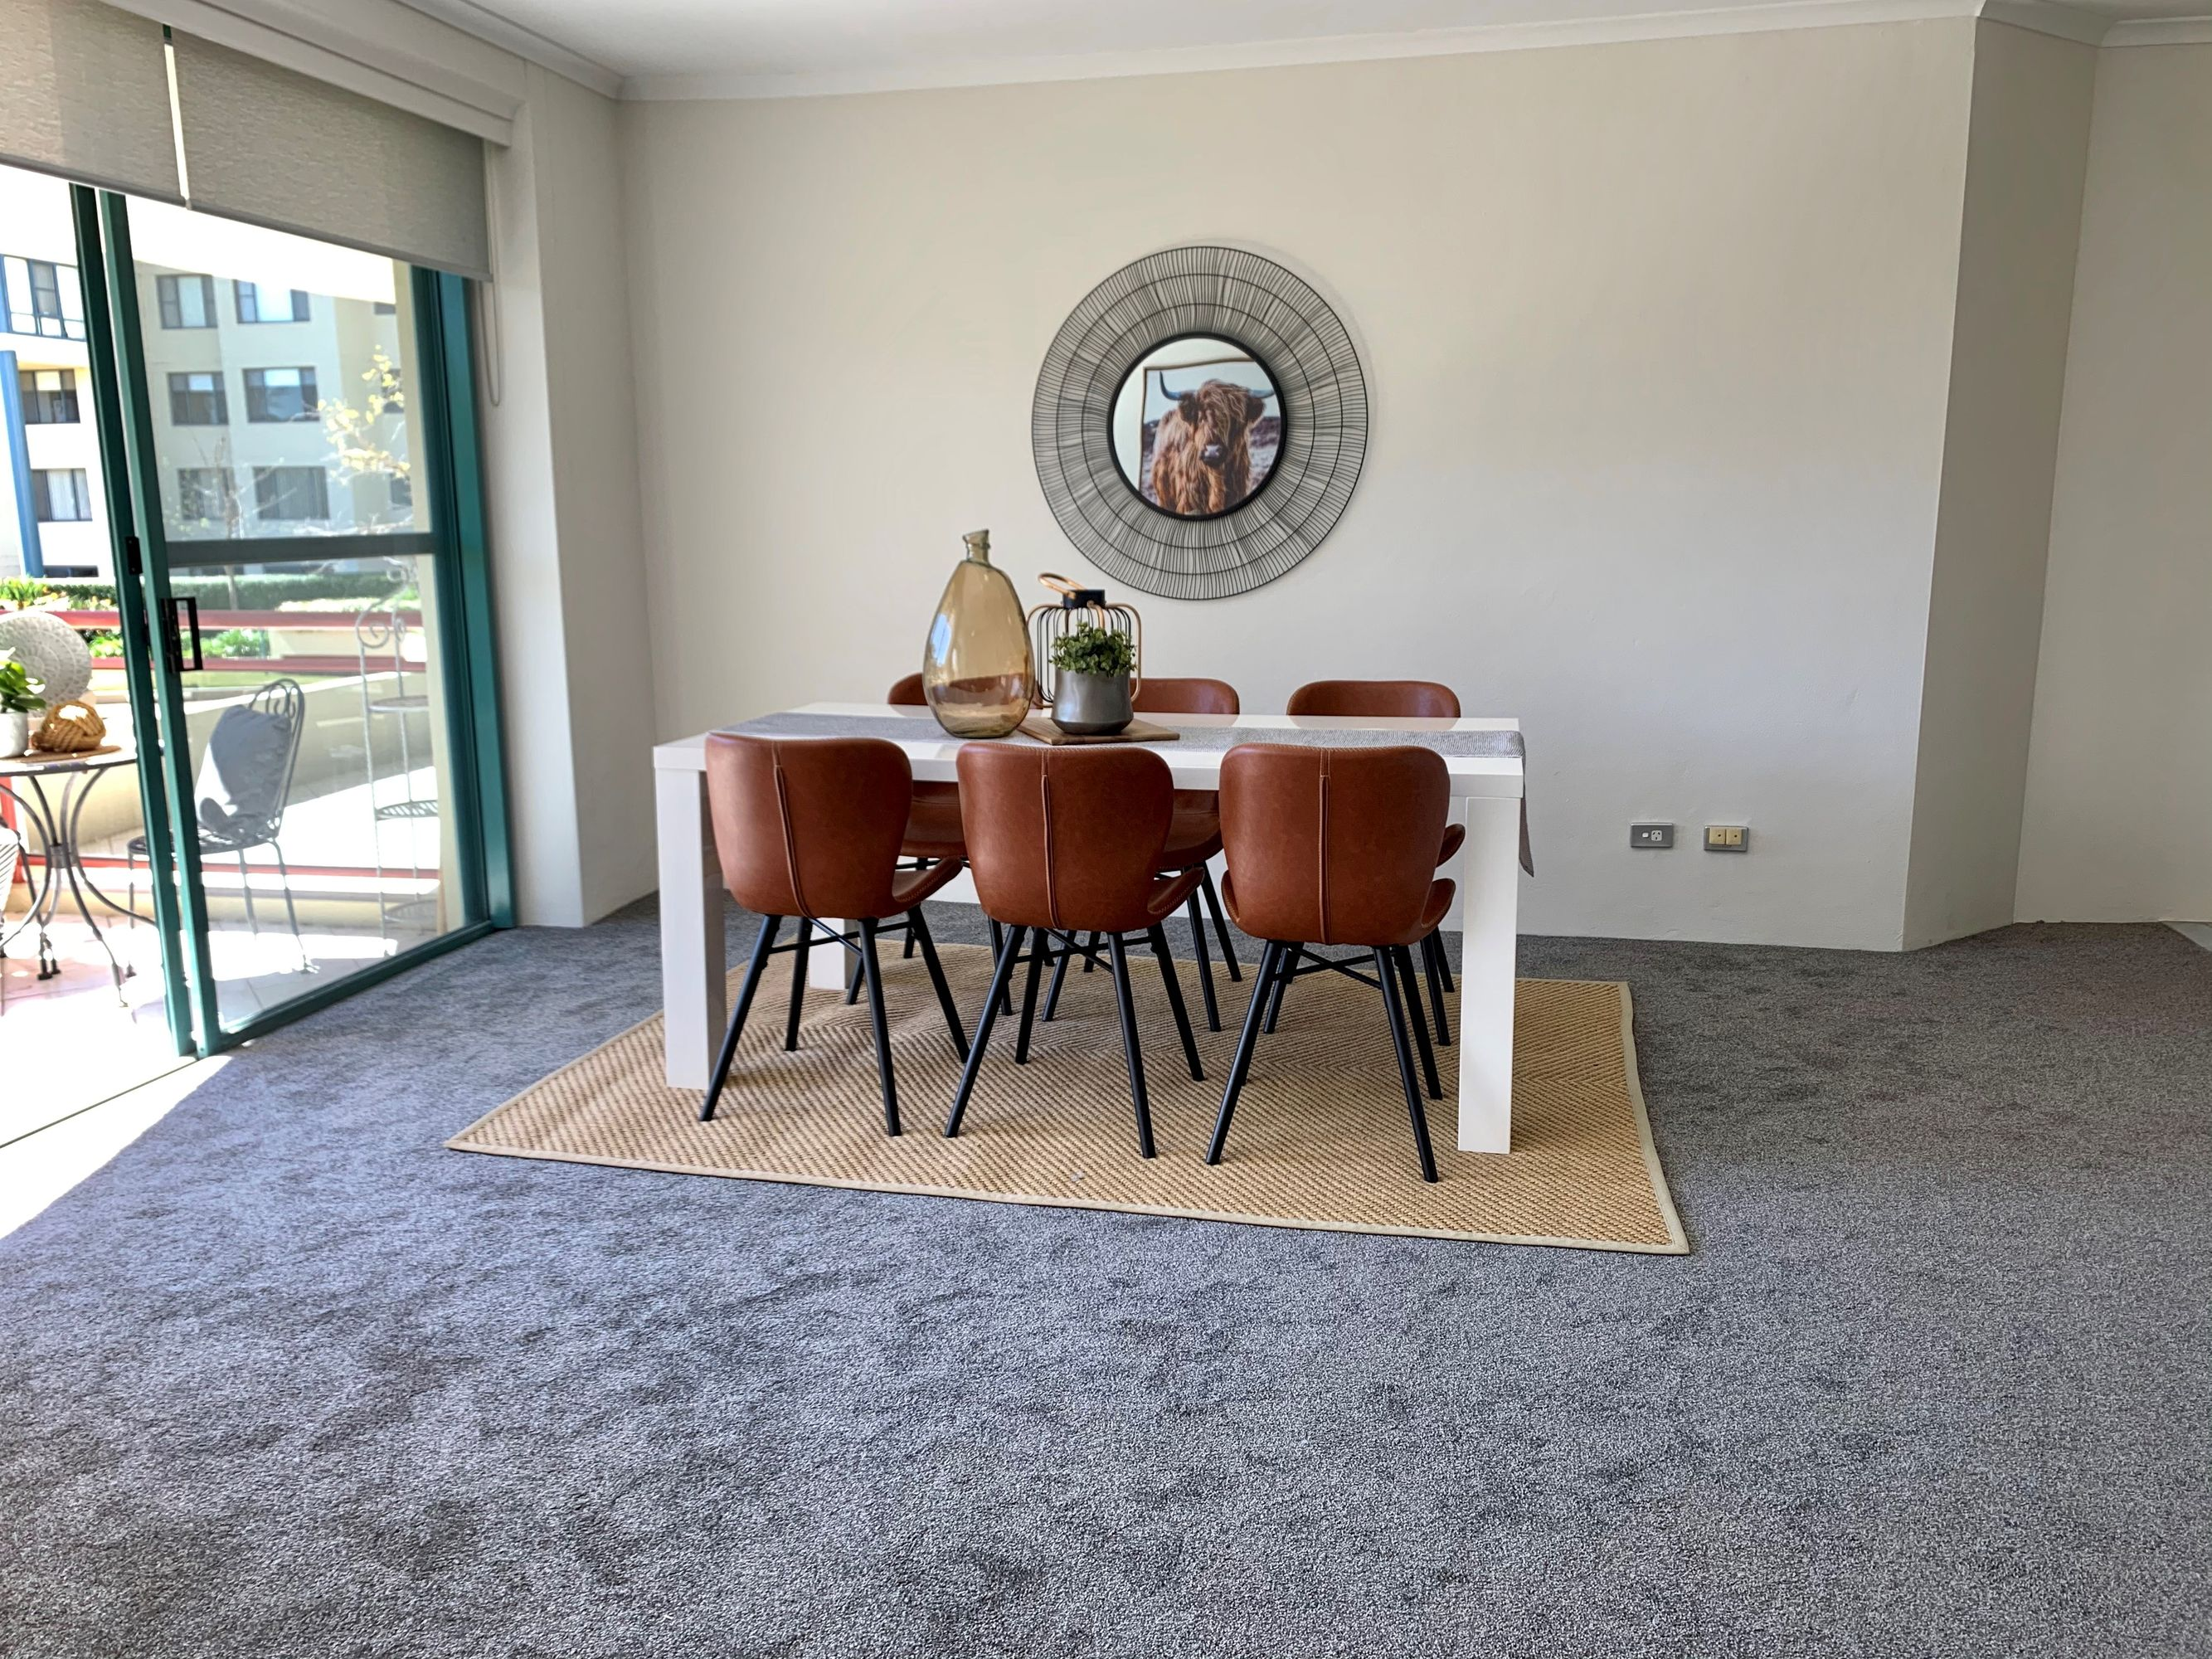 154/1-15 Fontenoy Road, Macquarie Park, NSW 2113